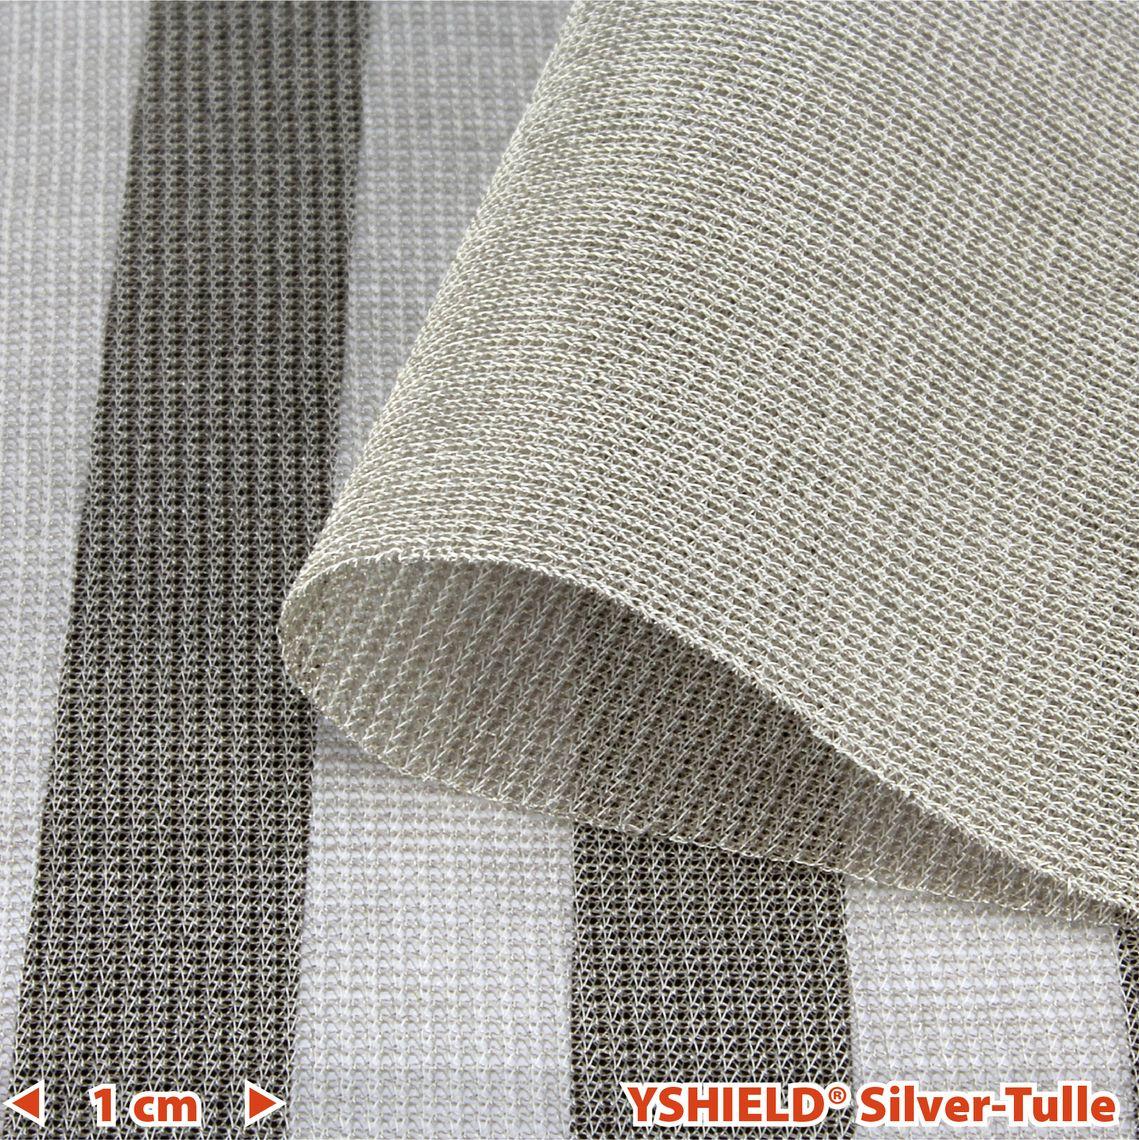 YSHIELD® SILVER-TULLE   Shielding fabric   Width 130 cm   1 meter